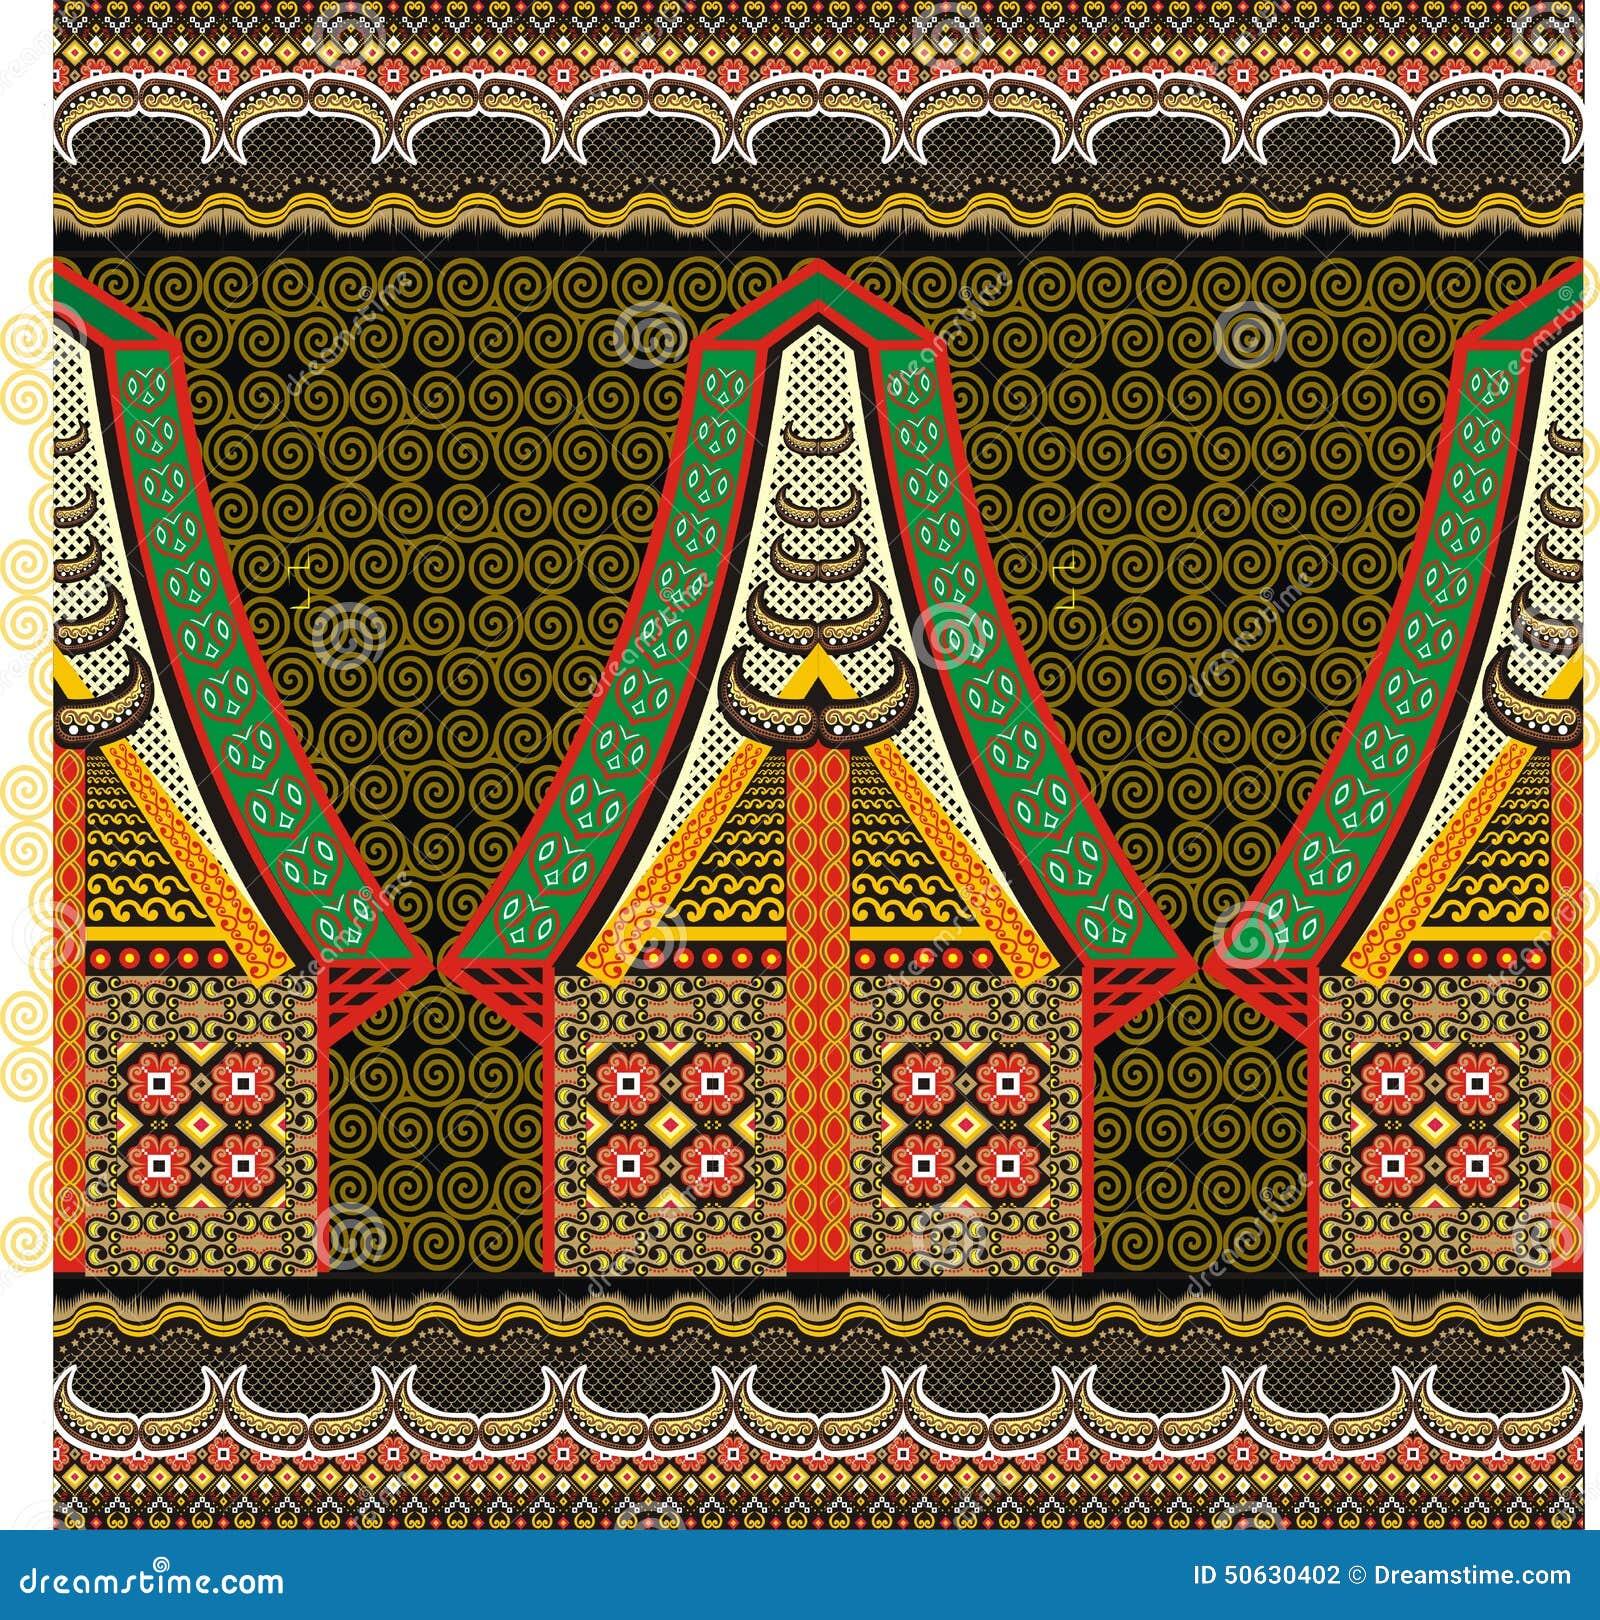 Indonesian batik motif from Toraja districk Sulawesi island.